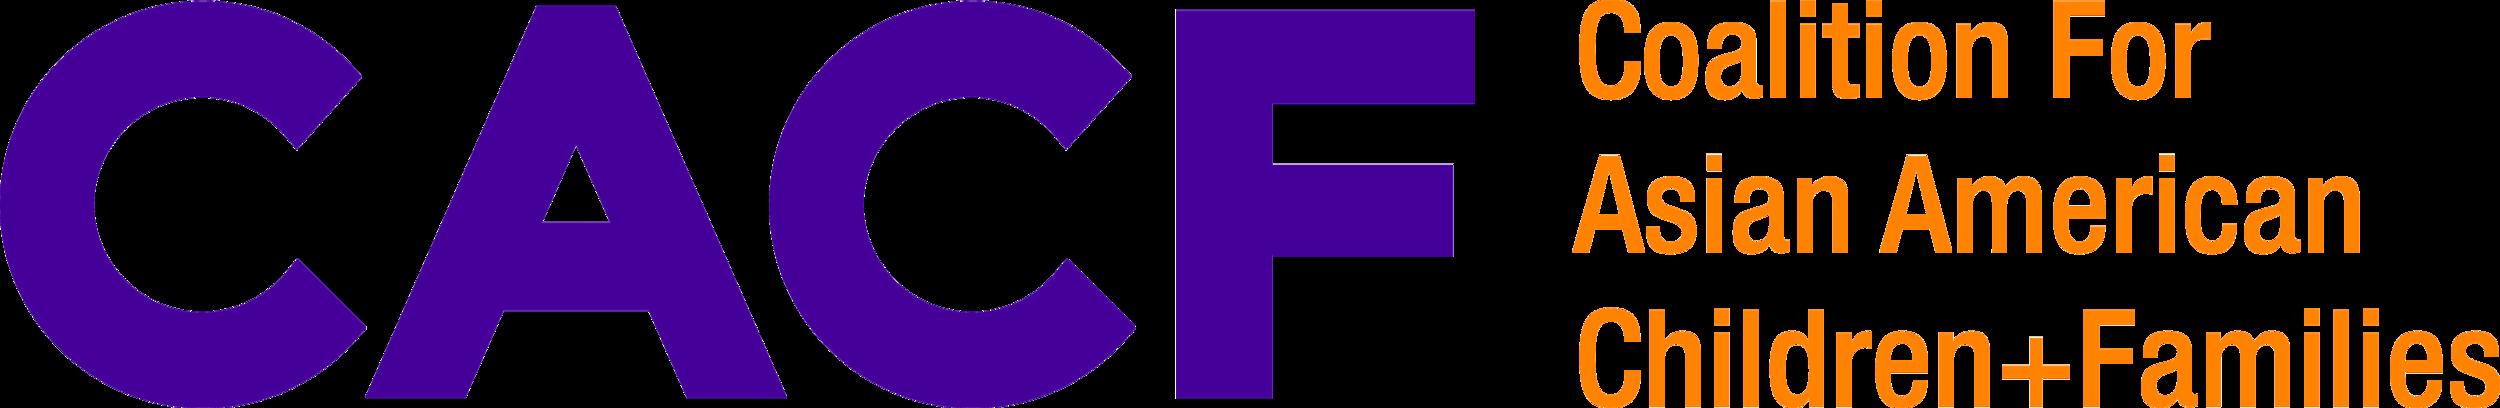 CACFFullNameHor_RGB_Purple_TransBG.png